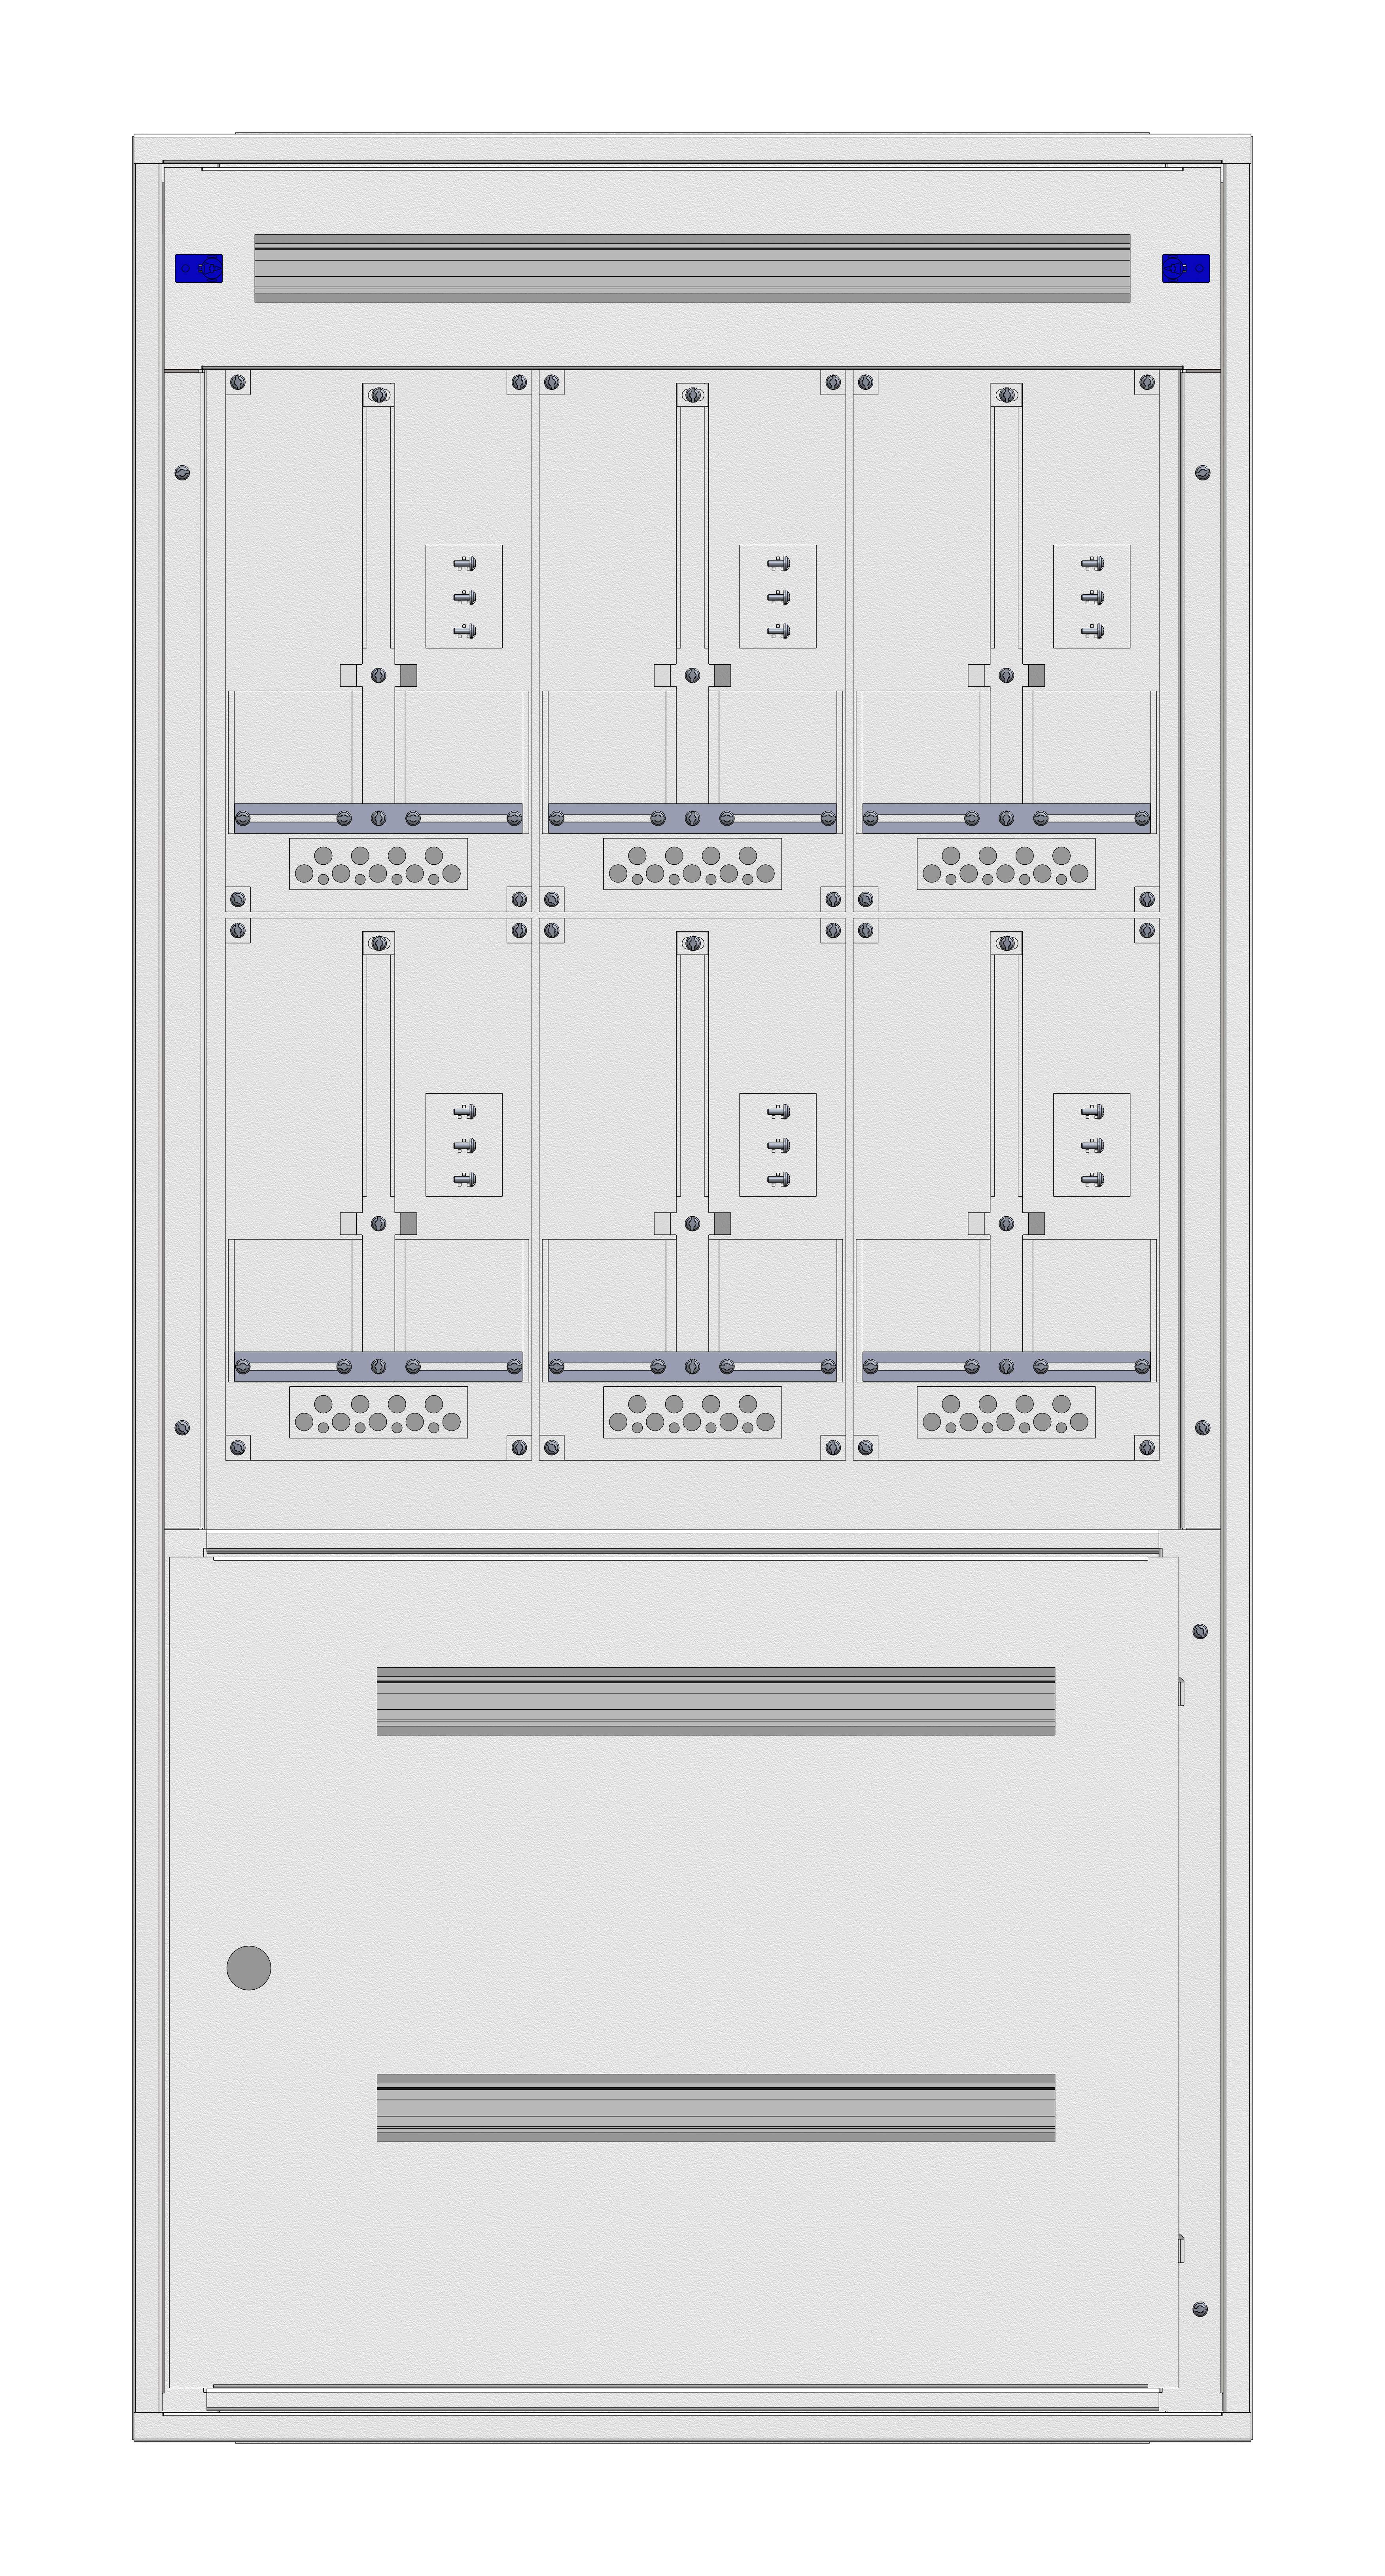 1 Stk Aufputz-Zählerverteiler 3A-33G/STMK 6ZP, H1605B810T250mm V2 IL162383GS